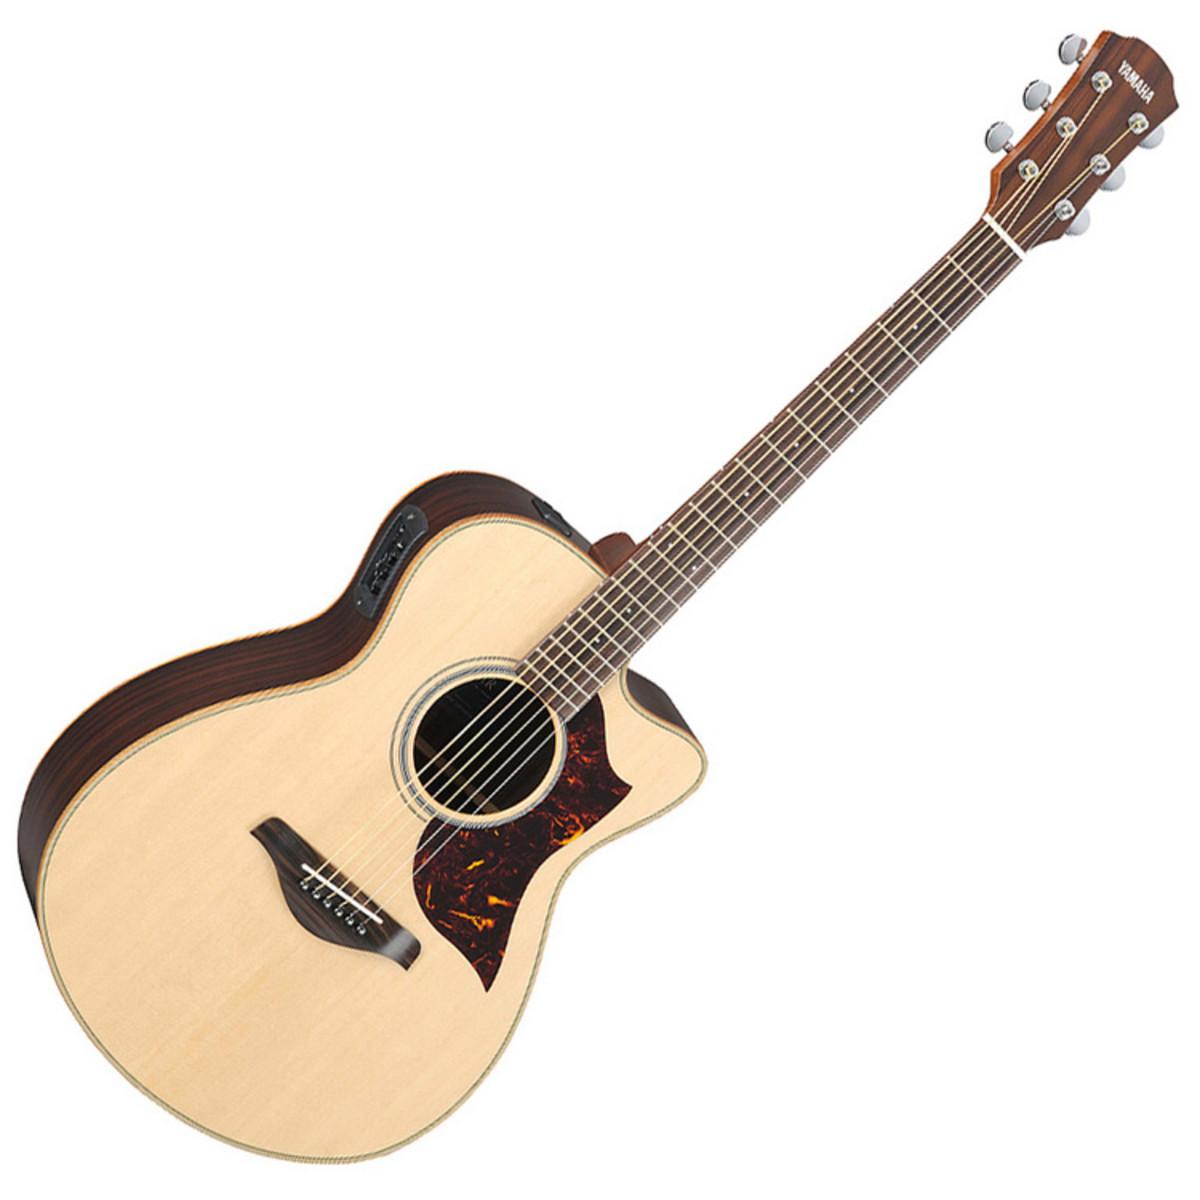 Disc yamaha ac1r electro acoustic guitar hiscox hard for Yamaha reface hard case